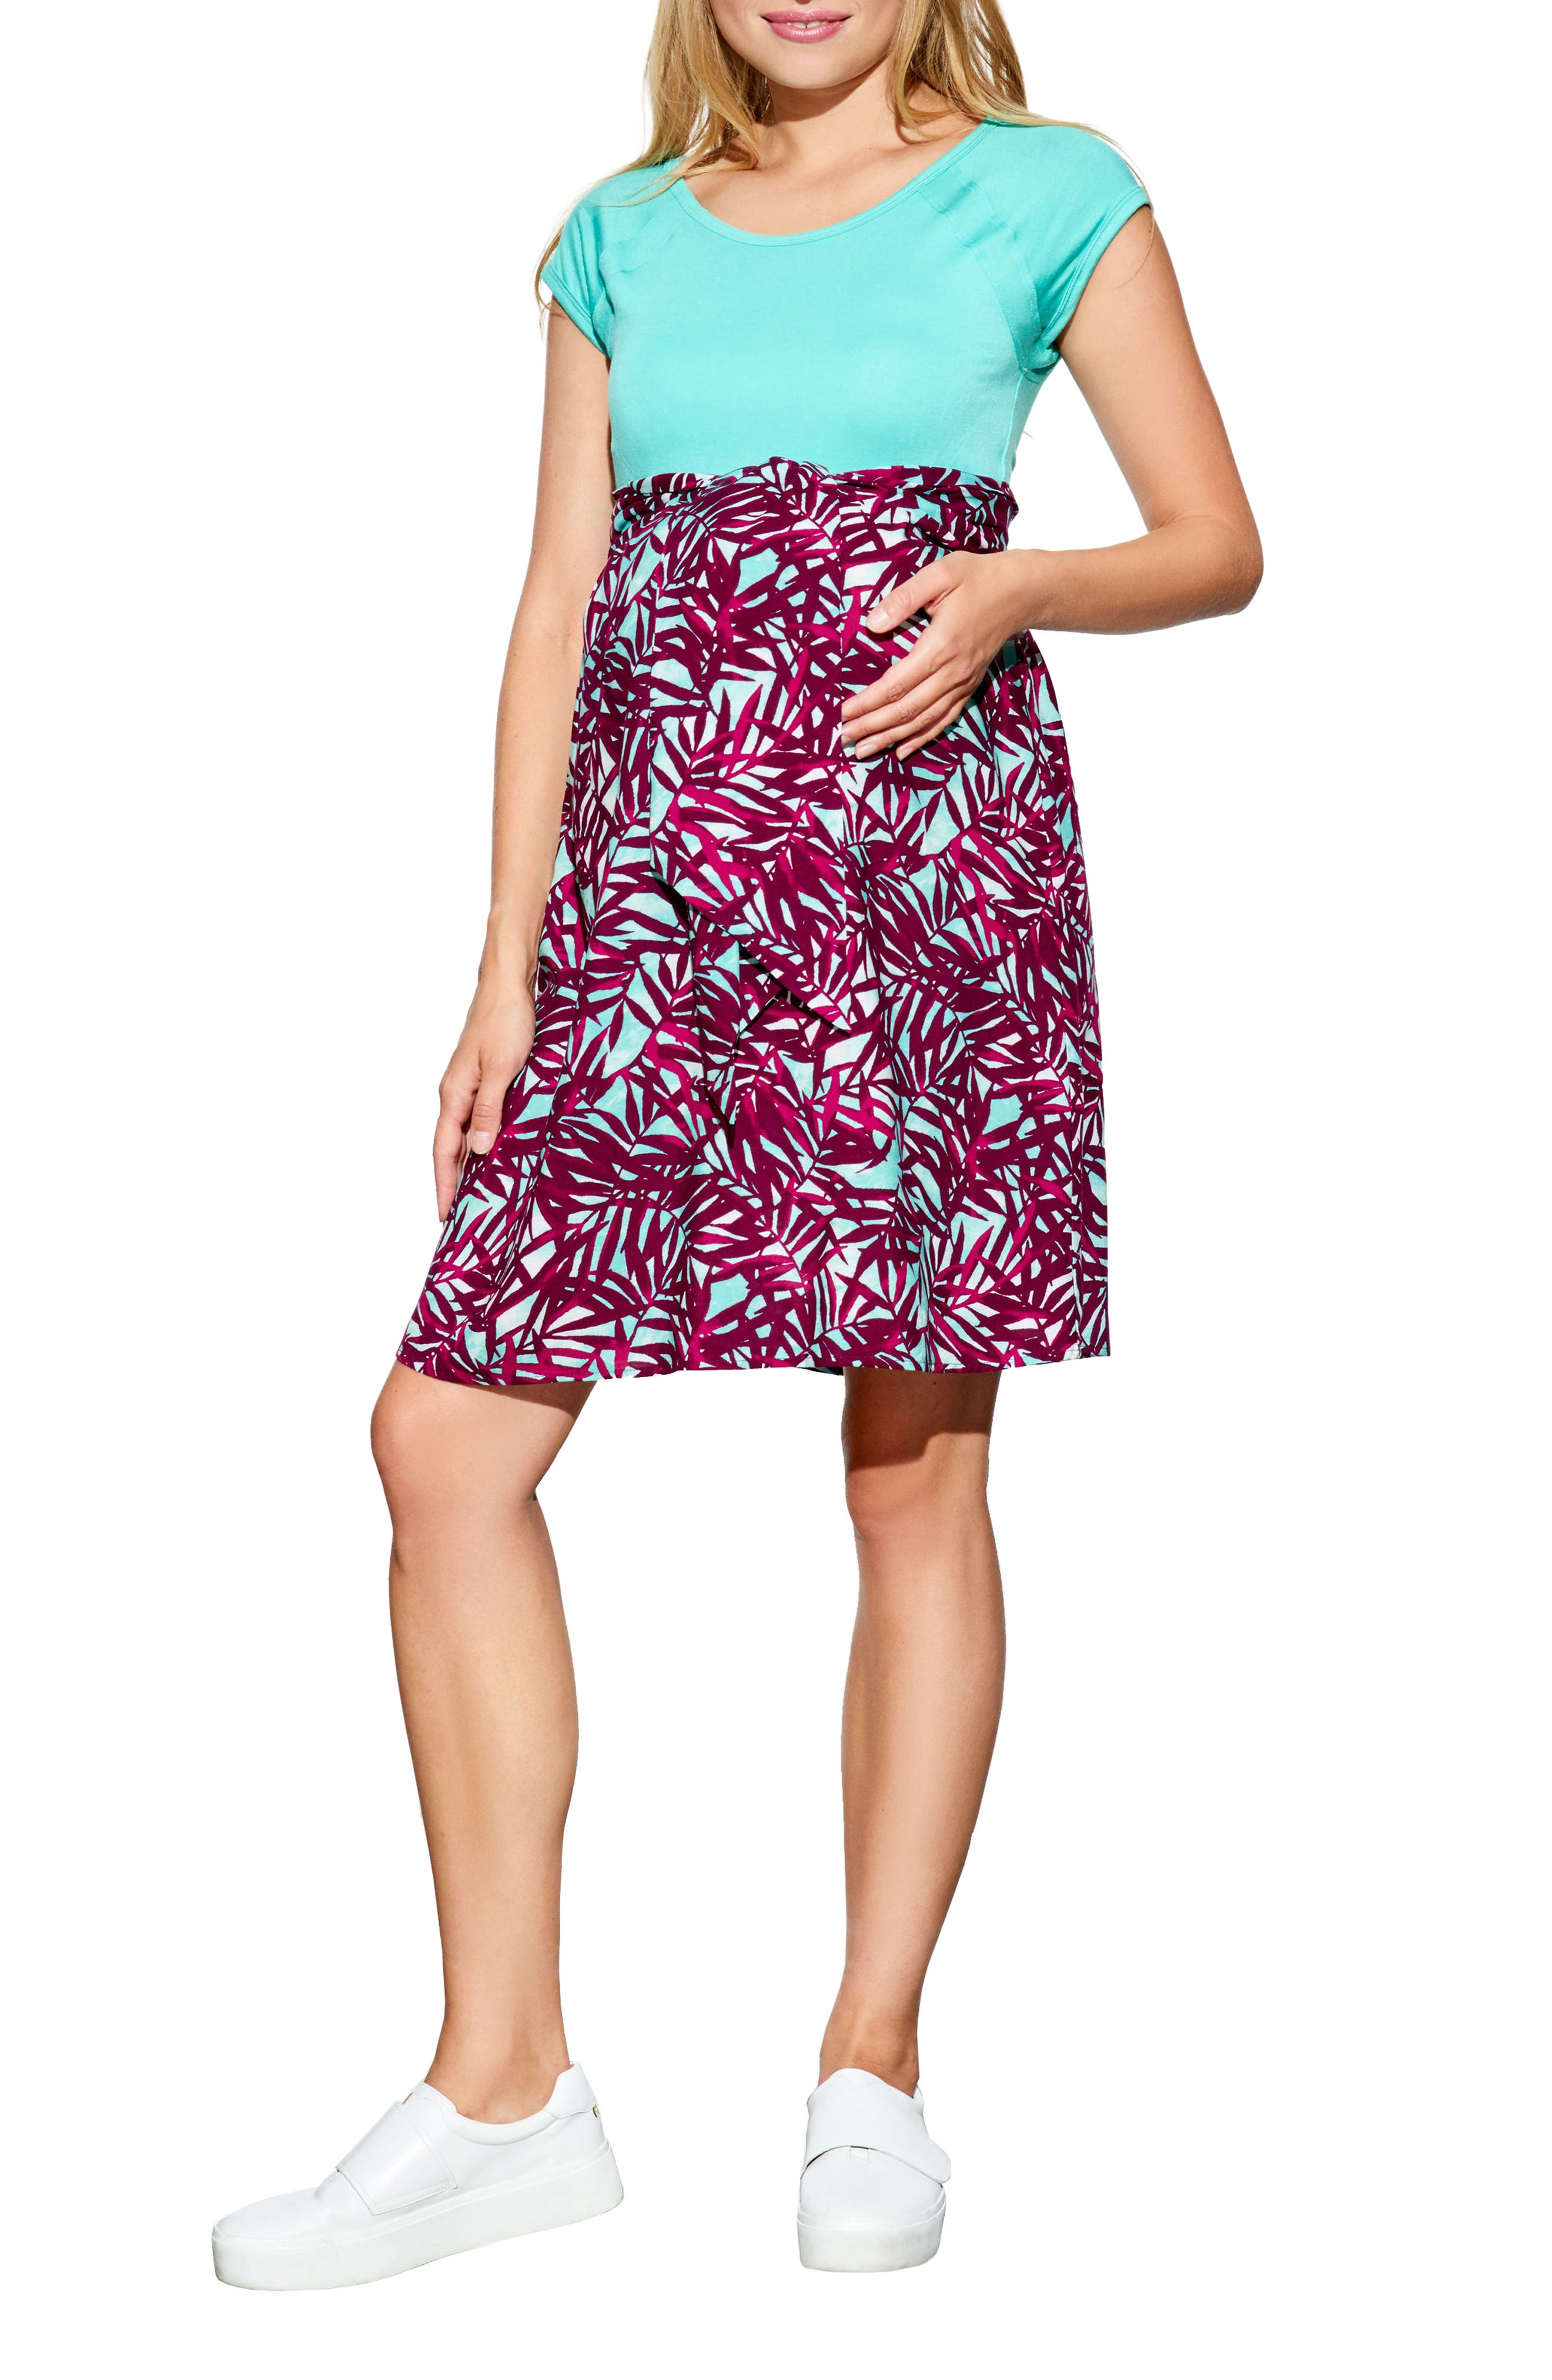 Tie Front Maternity Dress,                         Main,                         color, Mint/ Magtrpics